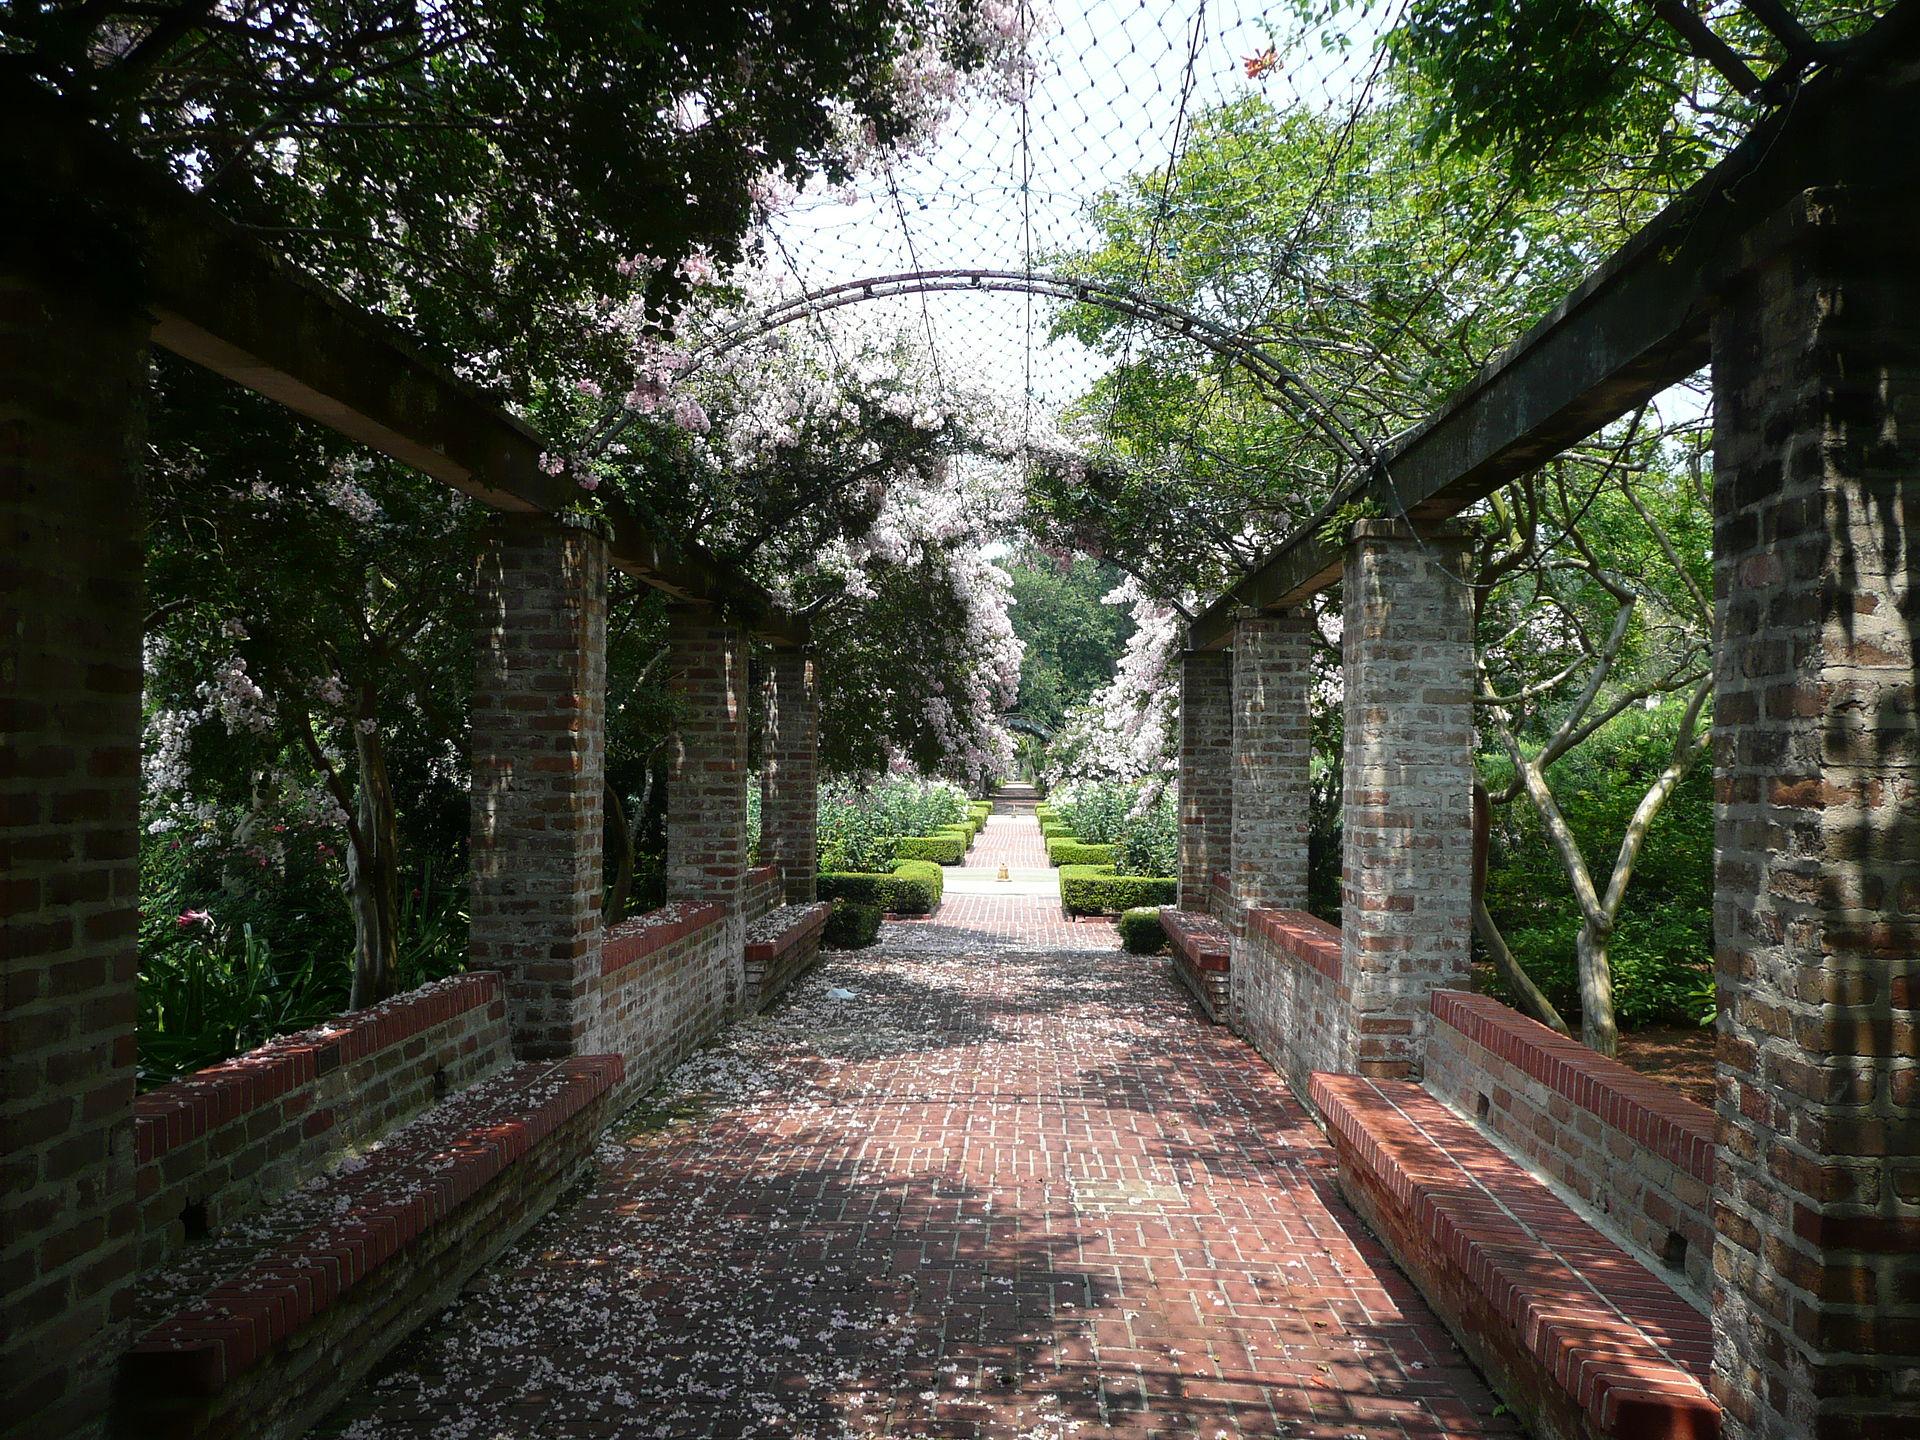 New_Orleans_Botanical_Garden_Walkway.jpg